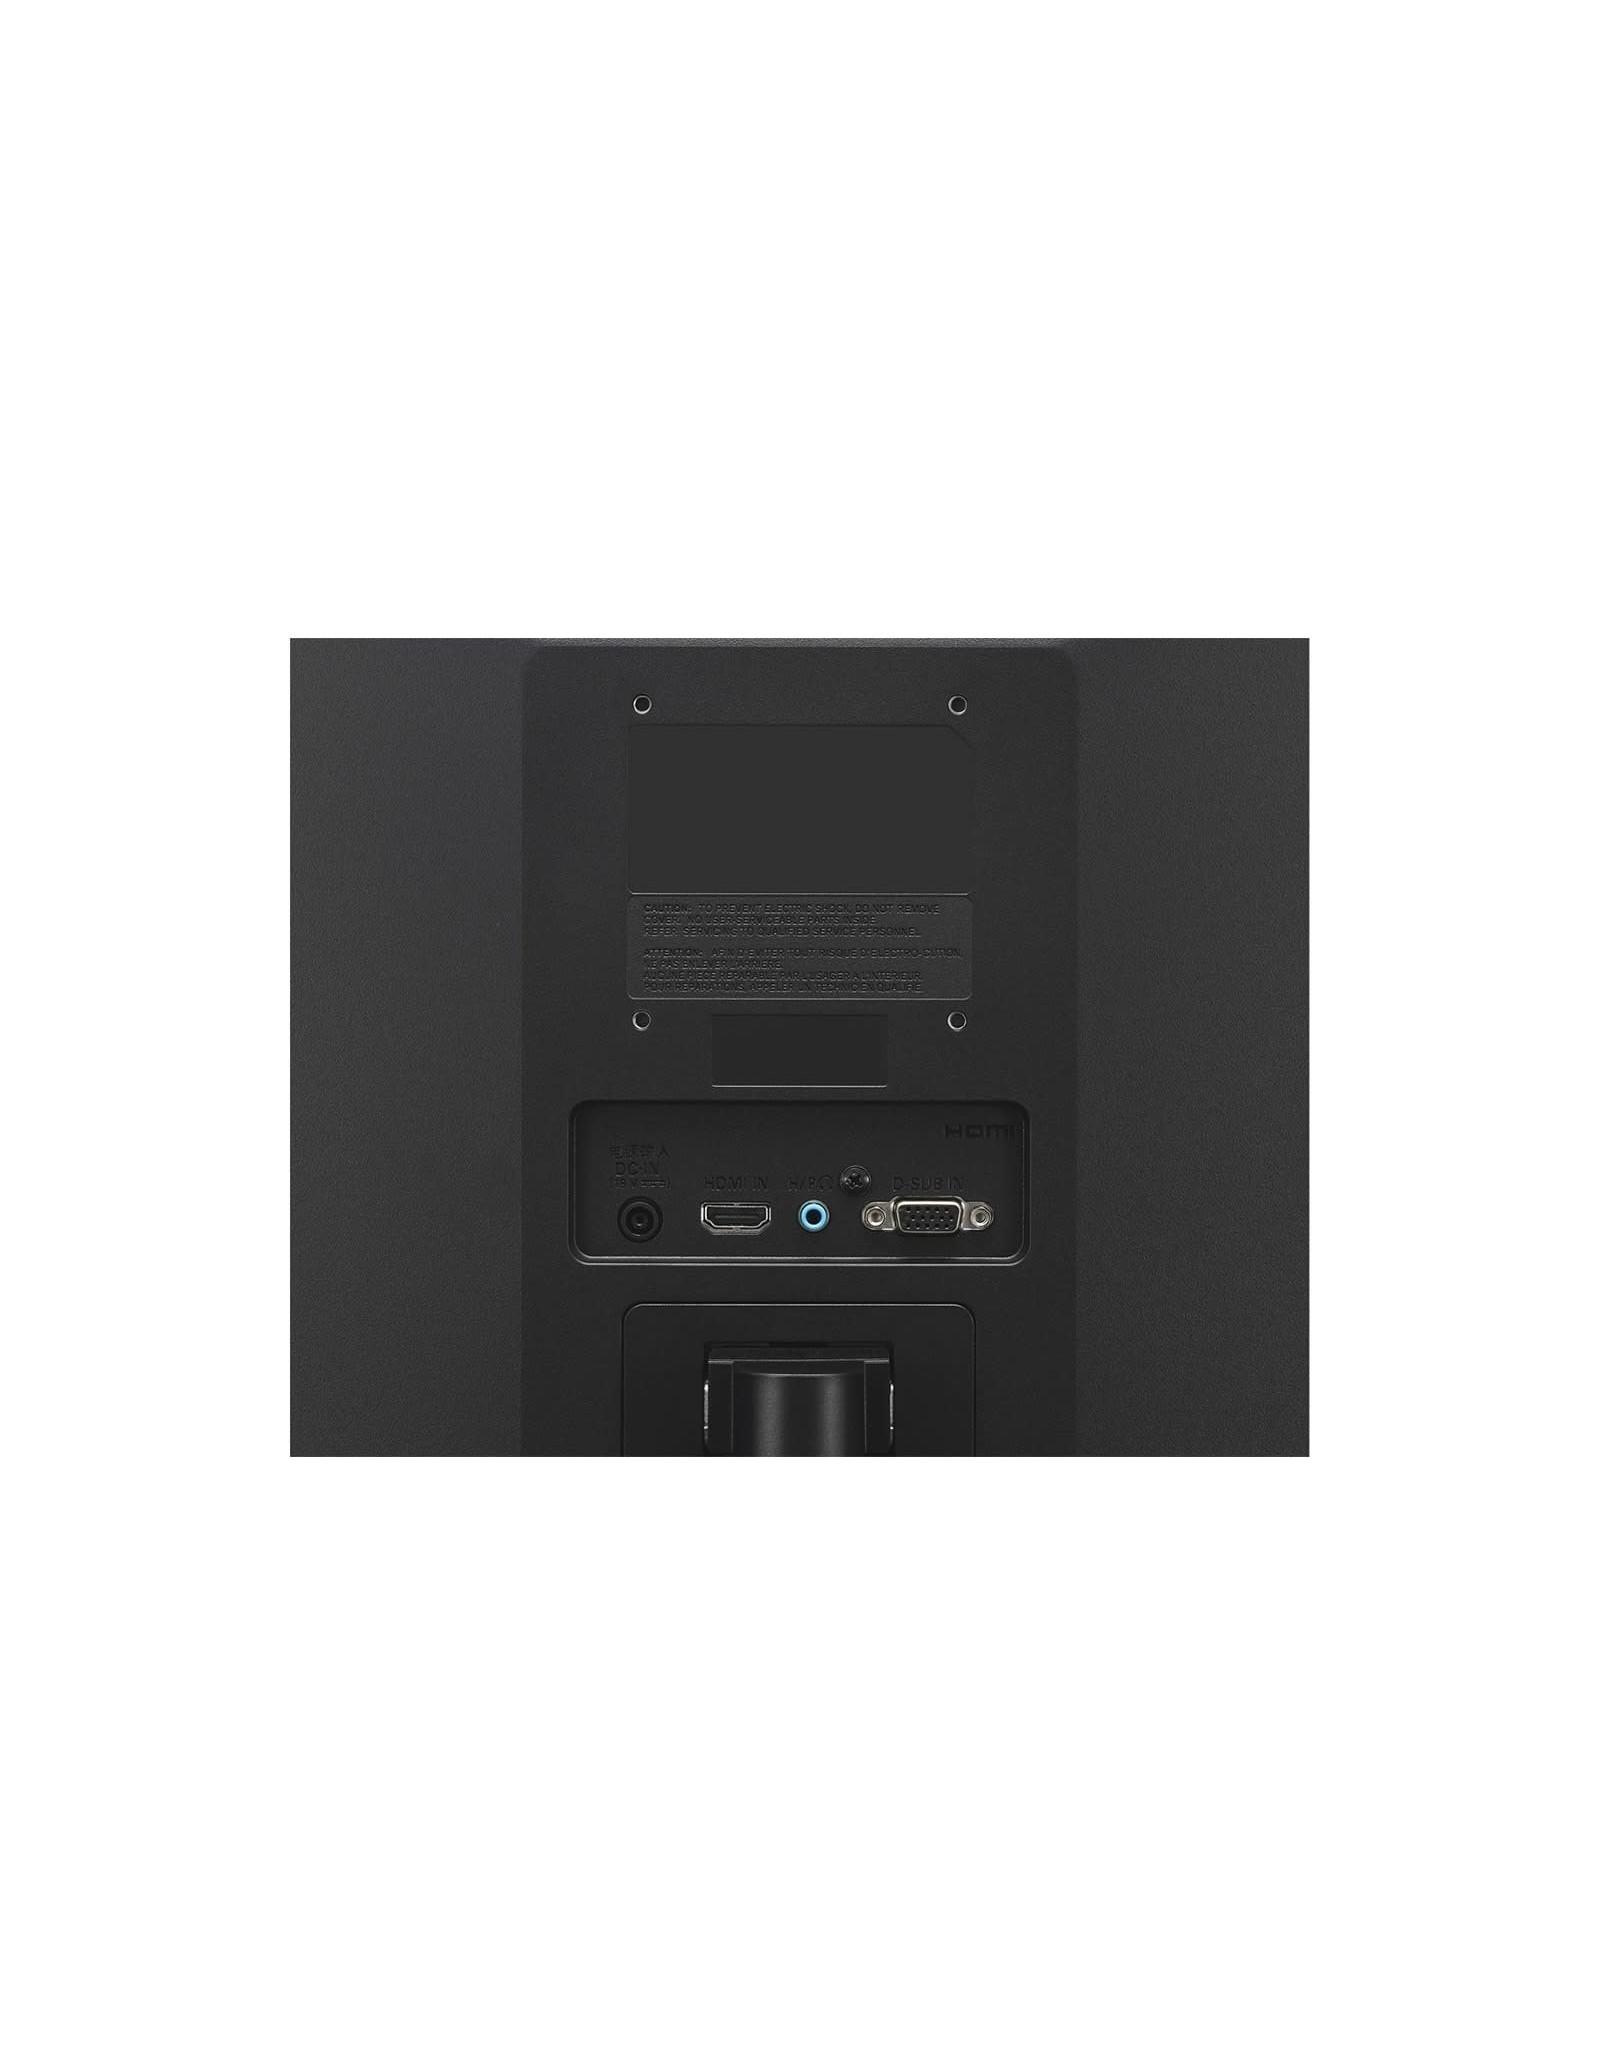 LG LG 24'' Full HD IPS LED Monitor with AMD FreeSync™ (1920x1080) (16:9) HDMI/D-Sub